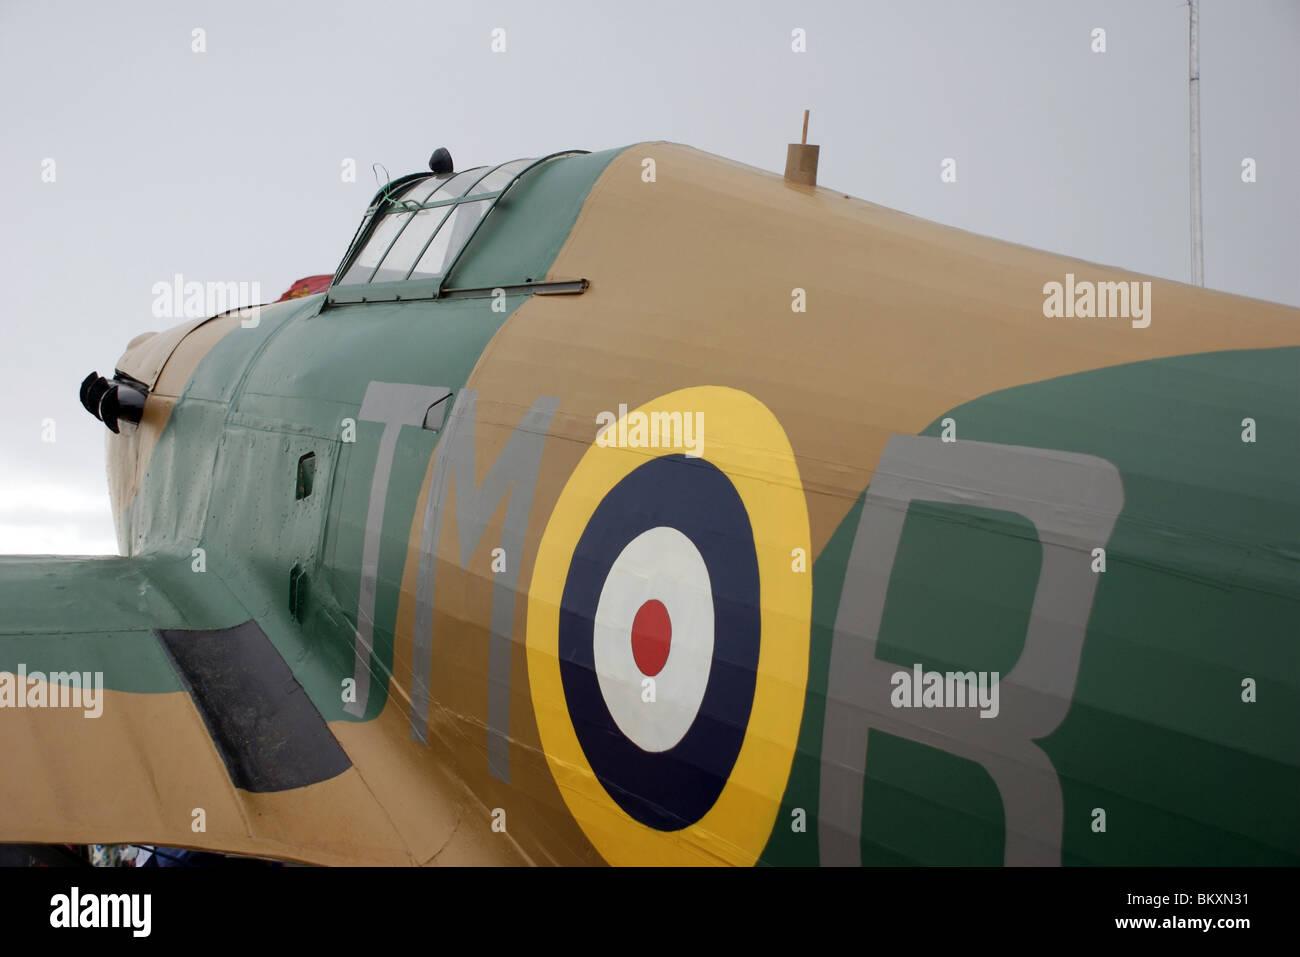 WW2 Hurricane fighter plane replica from the 1968 Battle of Britain film, Plymouth, Devon, UK - Stock Image